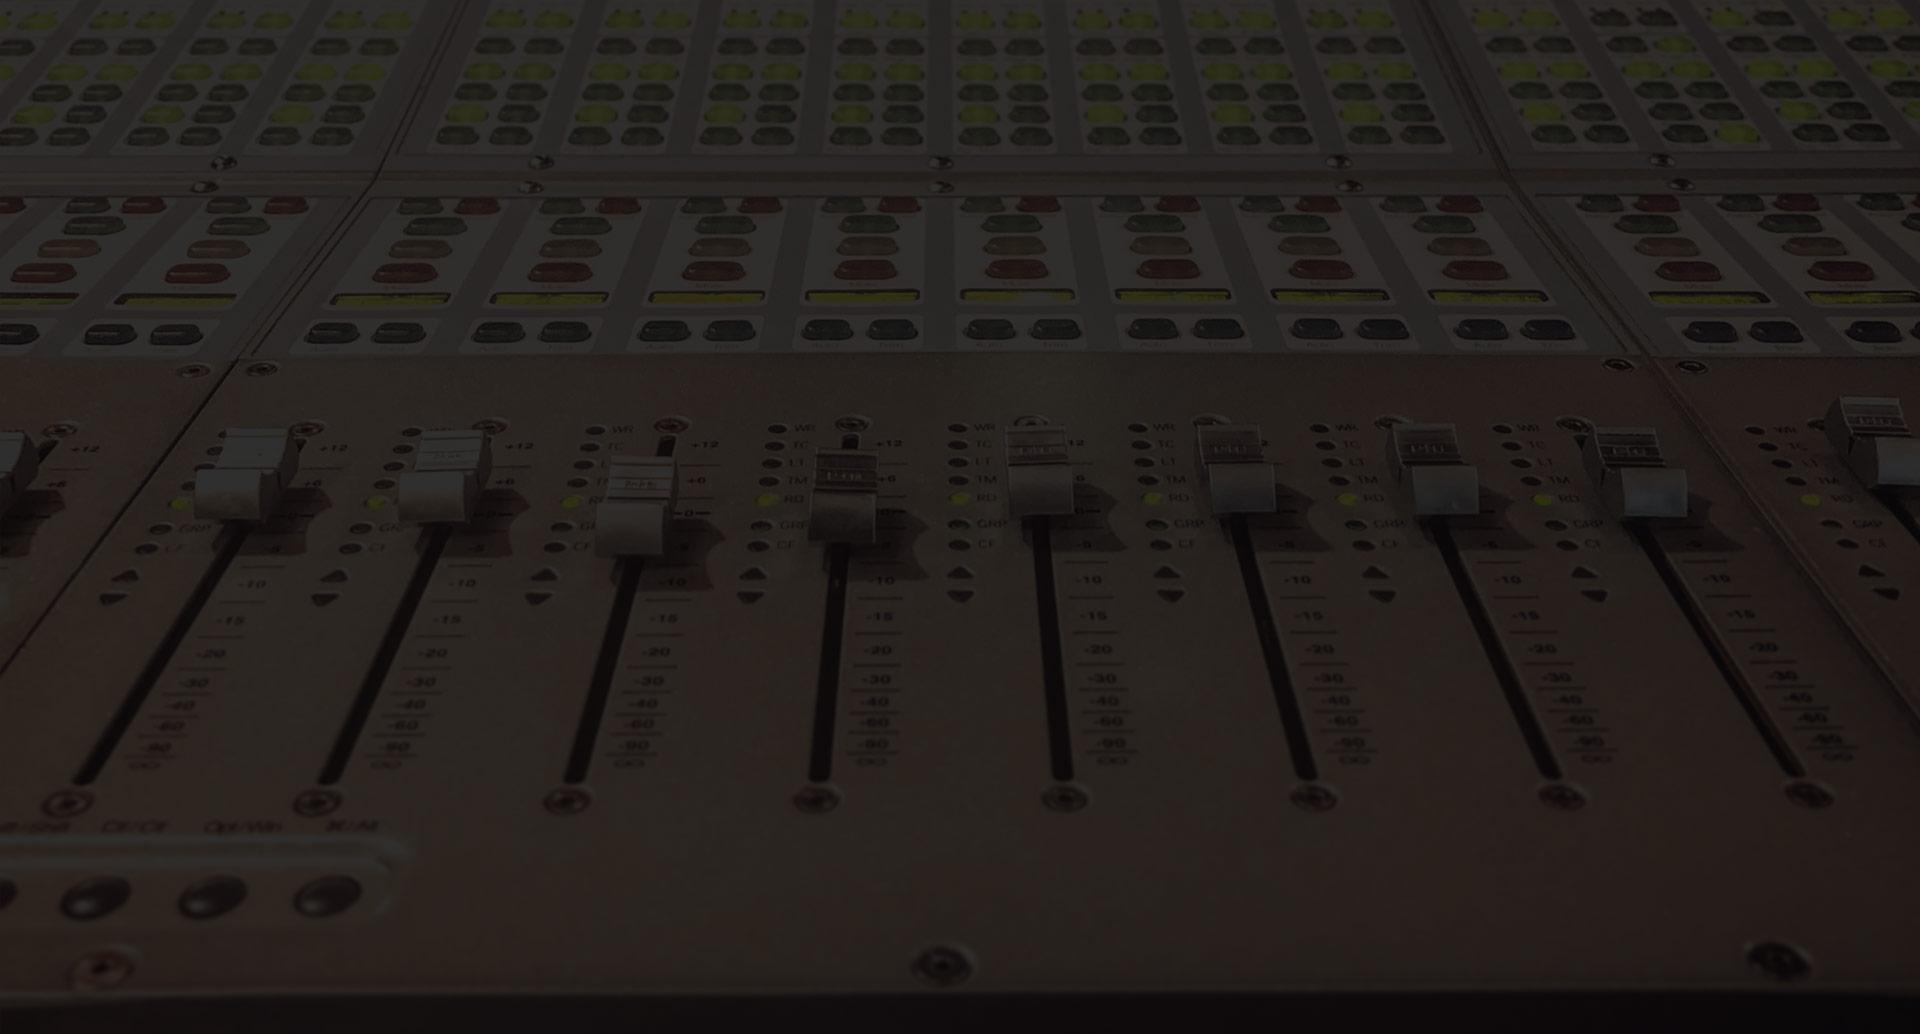 DIY vs. Pro Mix